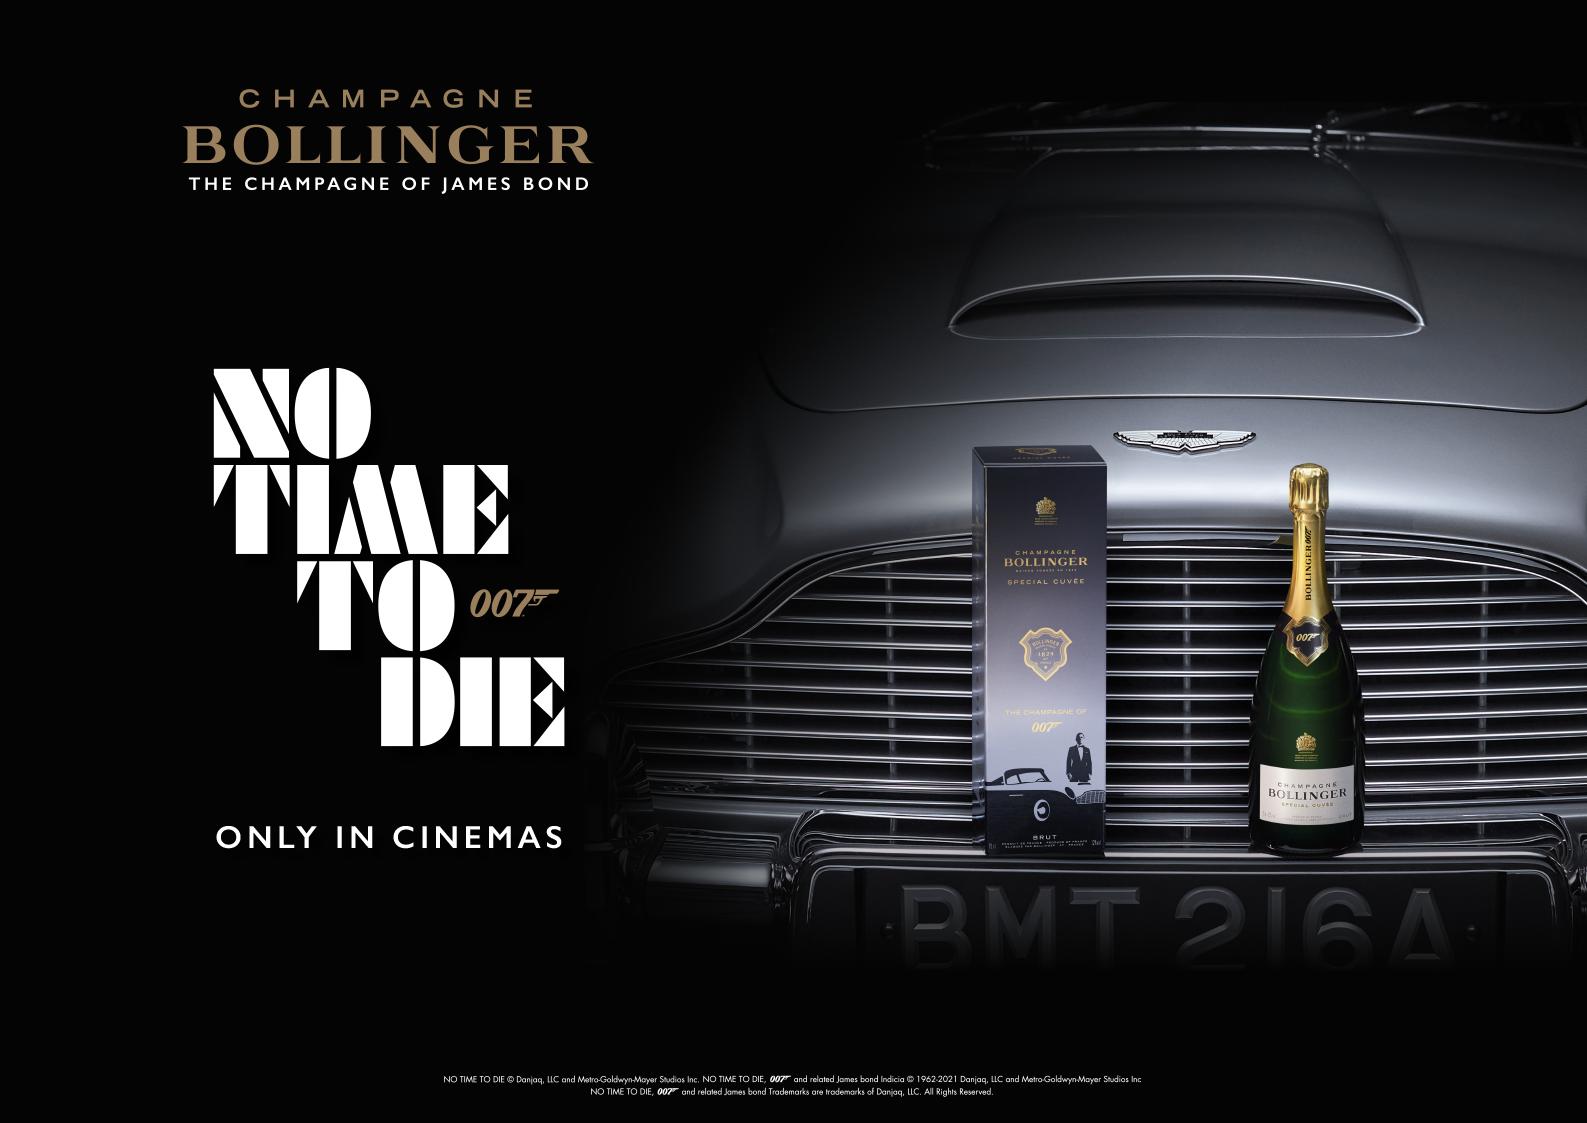 BOLLINGER2021-NTTD-007-HORIZONTAL_POST_RELEASE.png